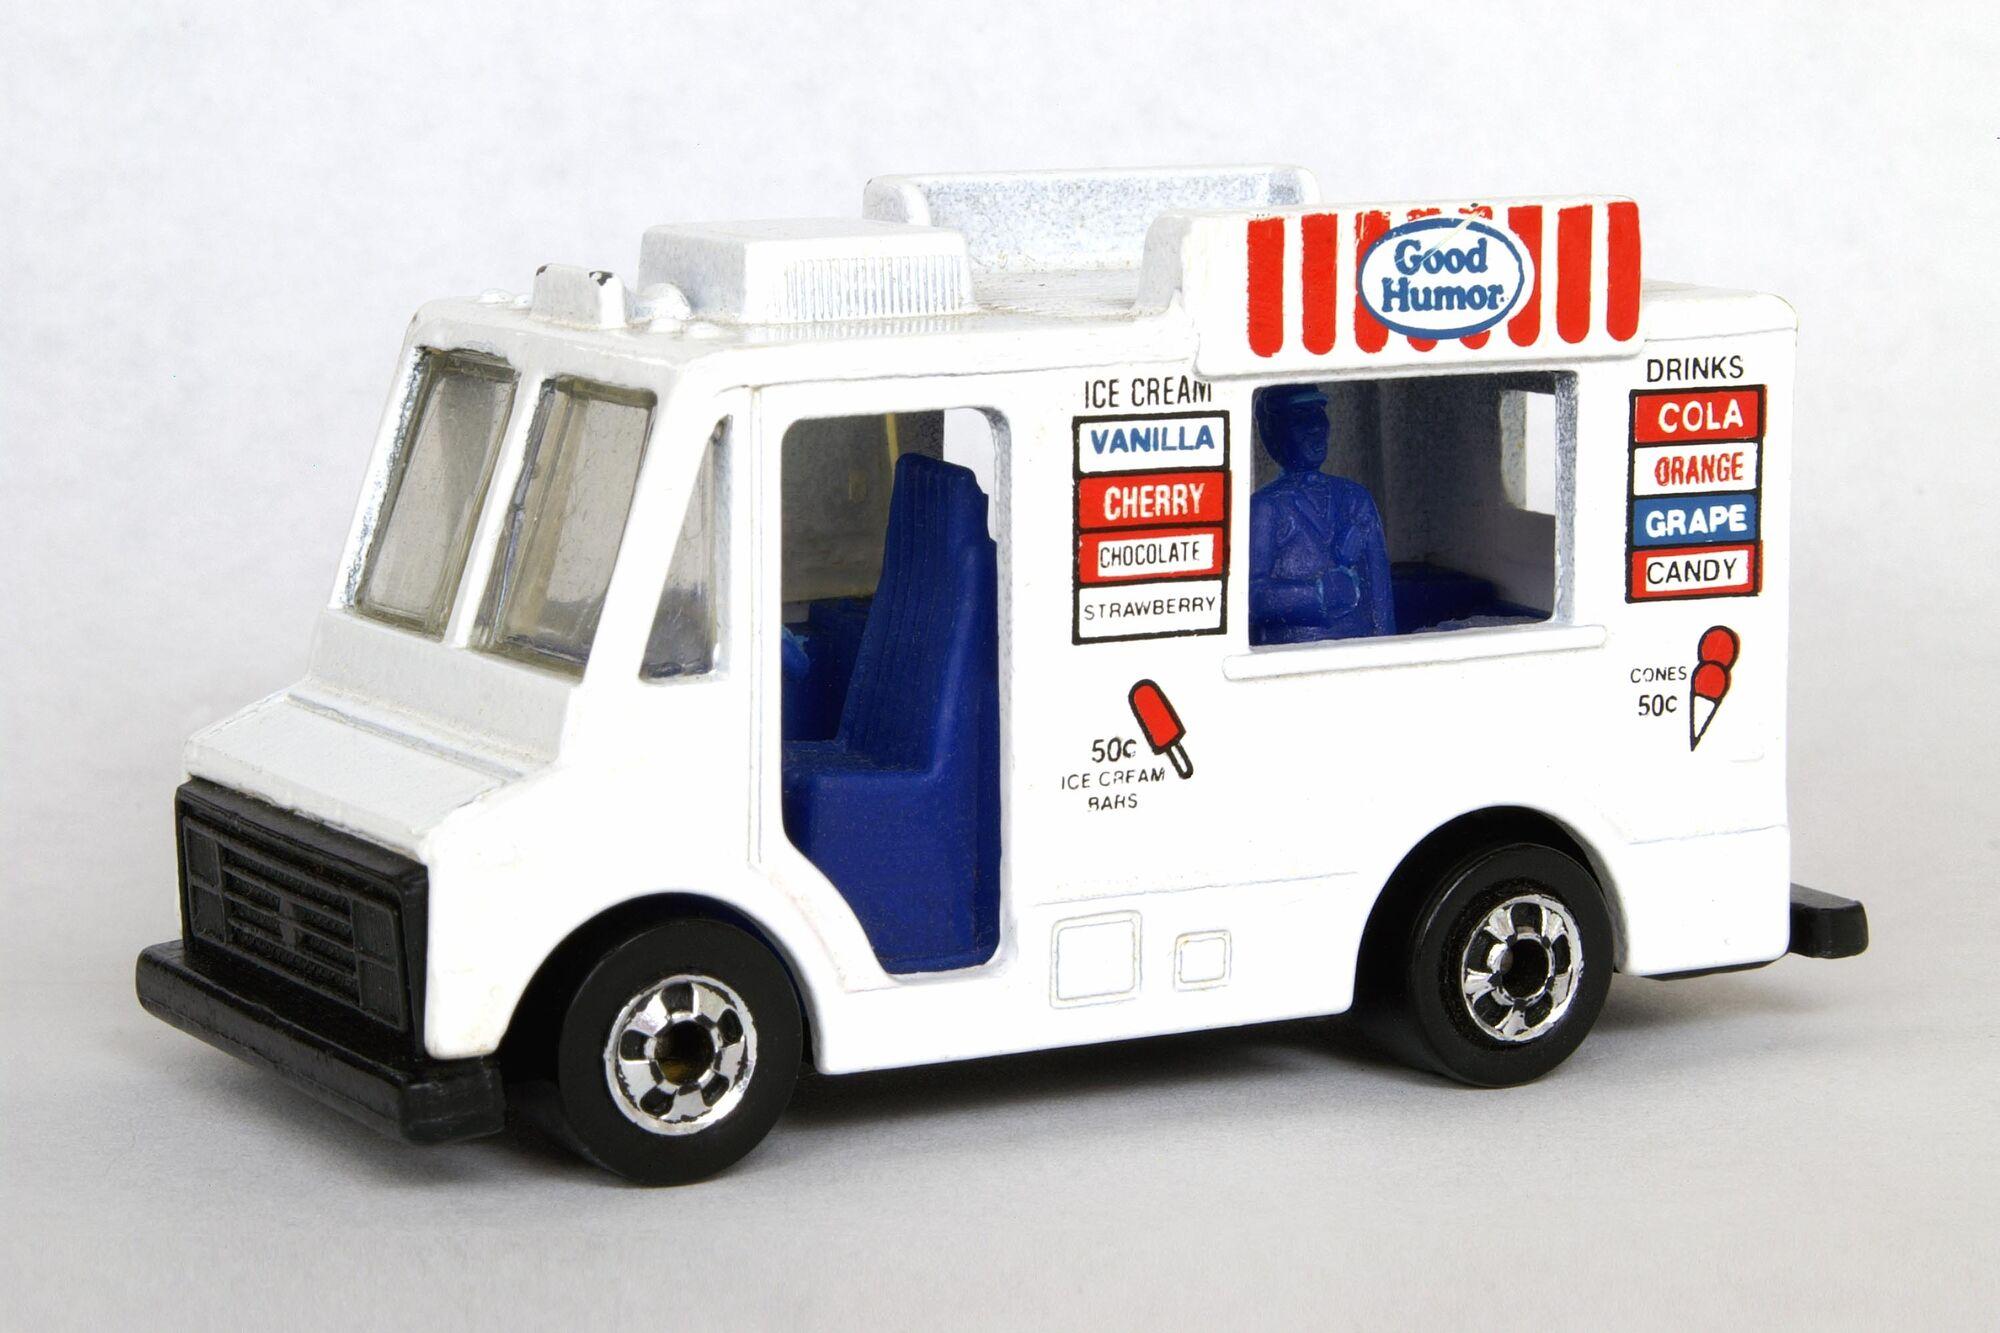 Good Humor Truck   Hot Wheels Wiki   FANDOM powered by Wikia